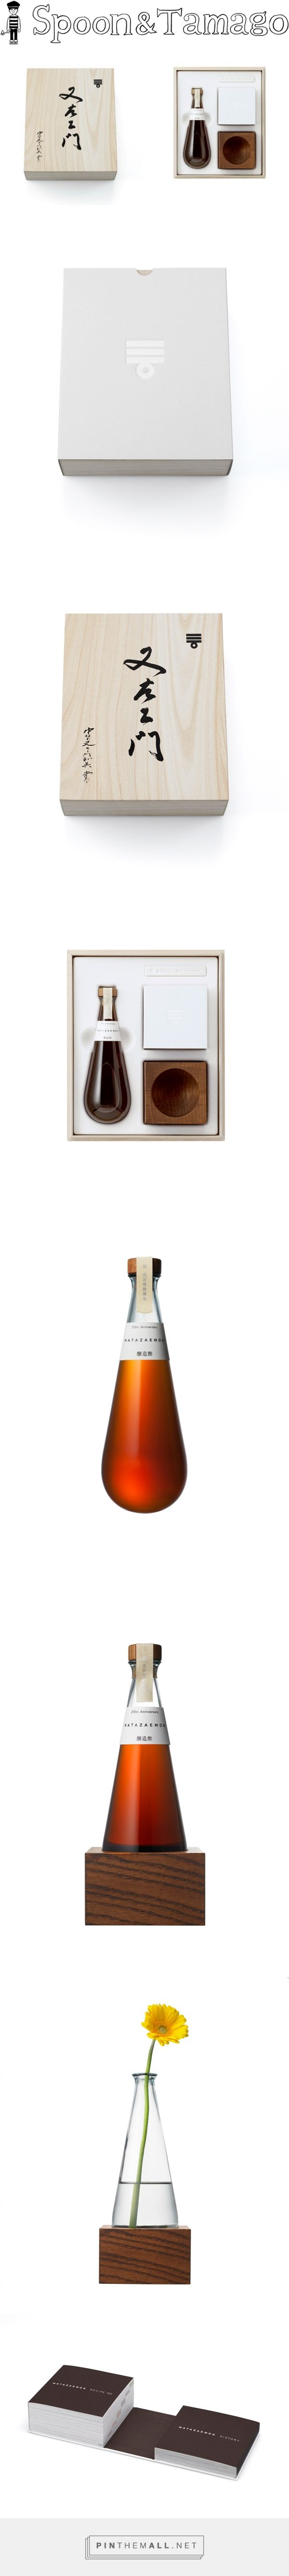 #Packaging Design for Mizkan Vinegar by Taku Satoh via Spoon & Tamago curated by Packaging Diva PD created via http://www.spoon-tamago.com/2014/12/09/packaging-design-for-mizkan-vinegar-by-taku-satoh/#more-30618